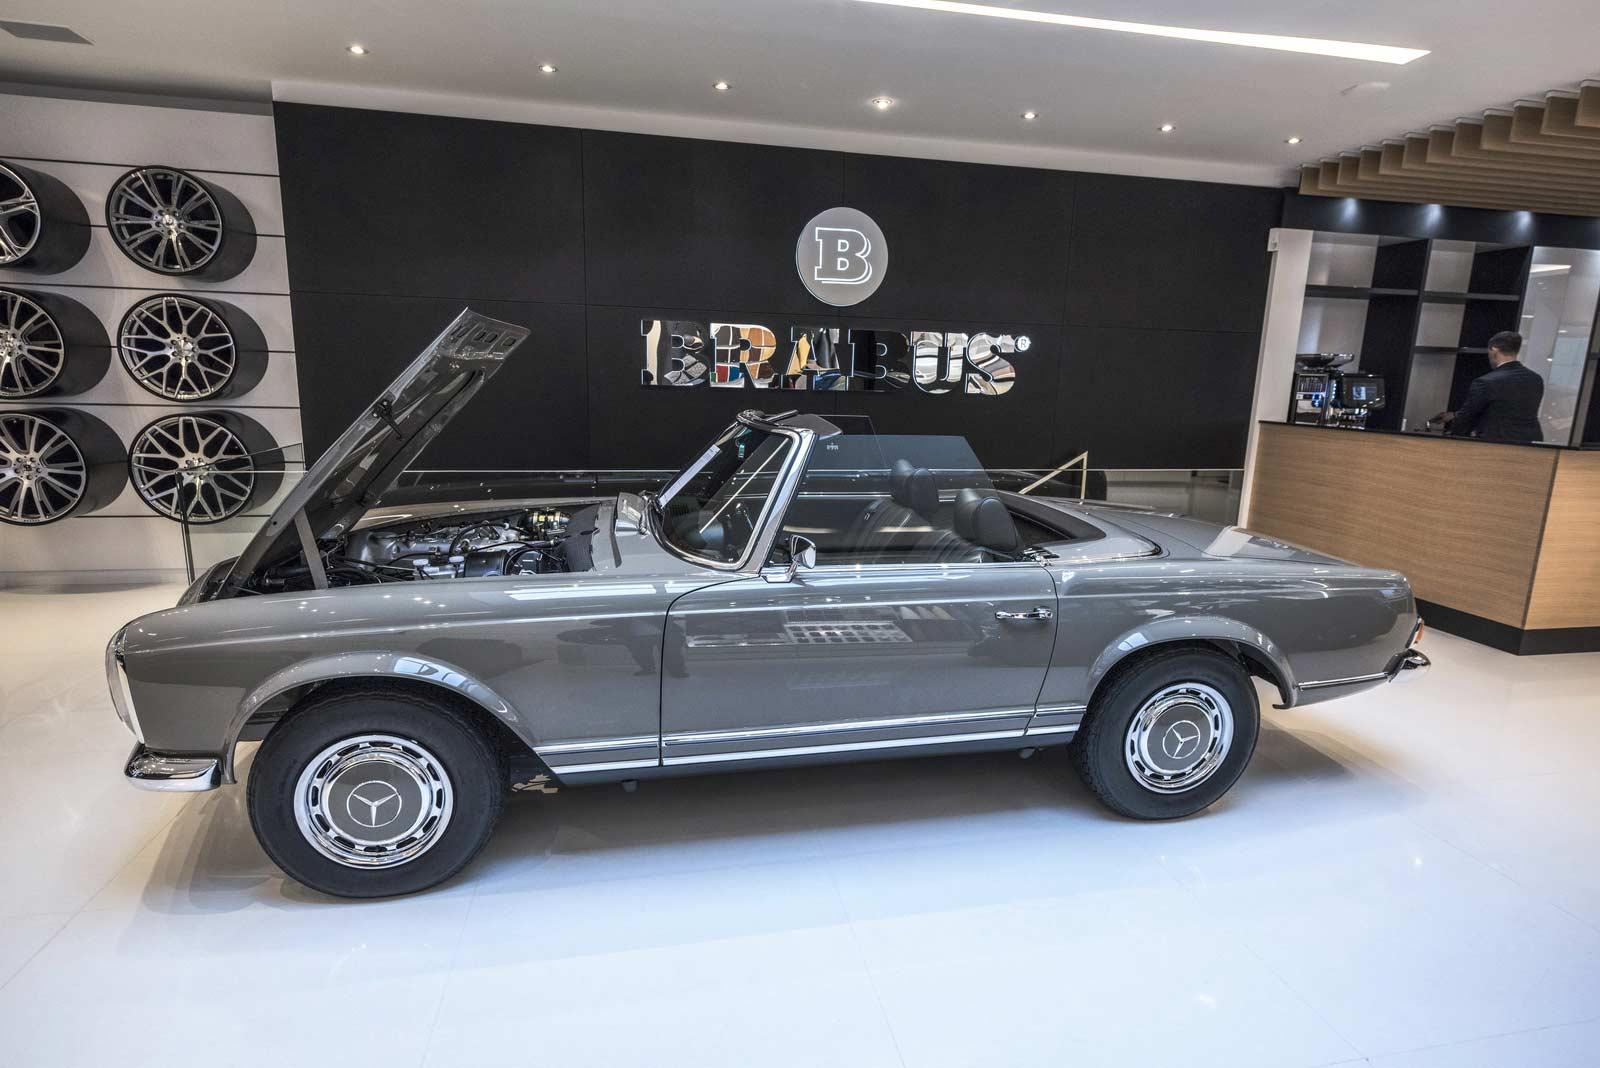 Brabus-Sunseeker-flagship-store-Dusseldorf_6